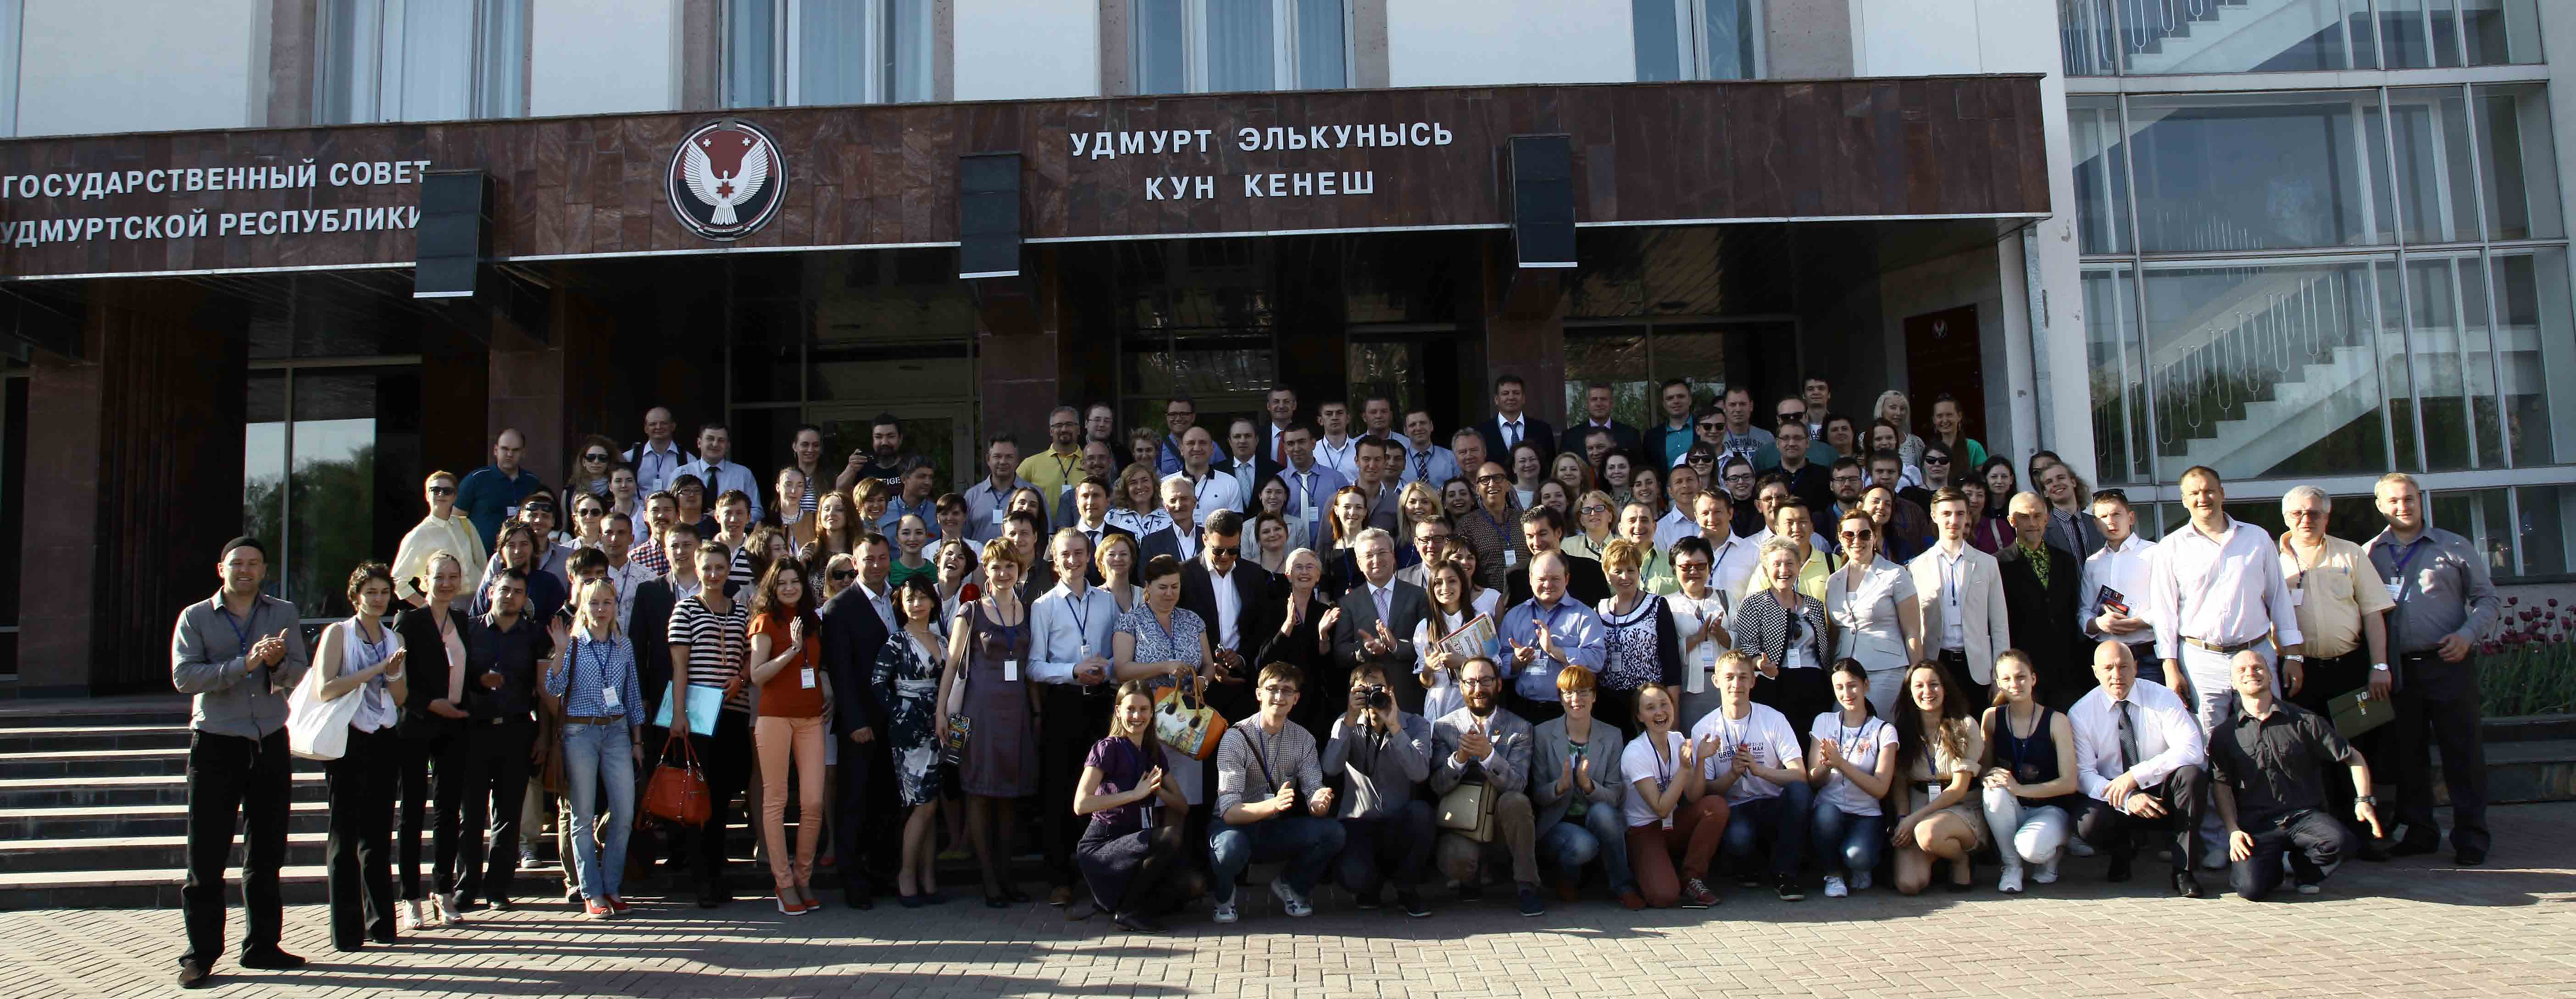 ARGO UrbanFest 2014, Izhevsk Attendees